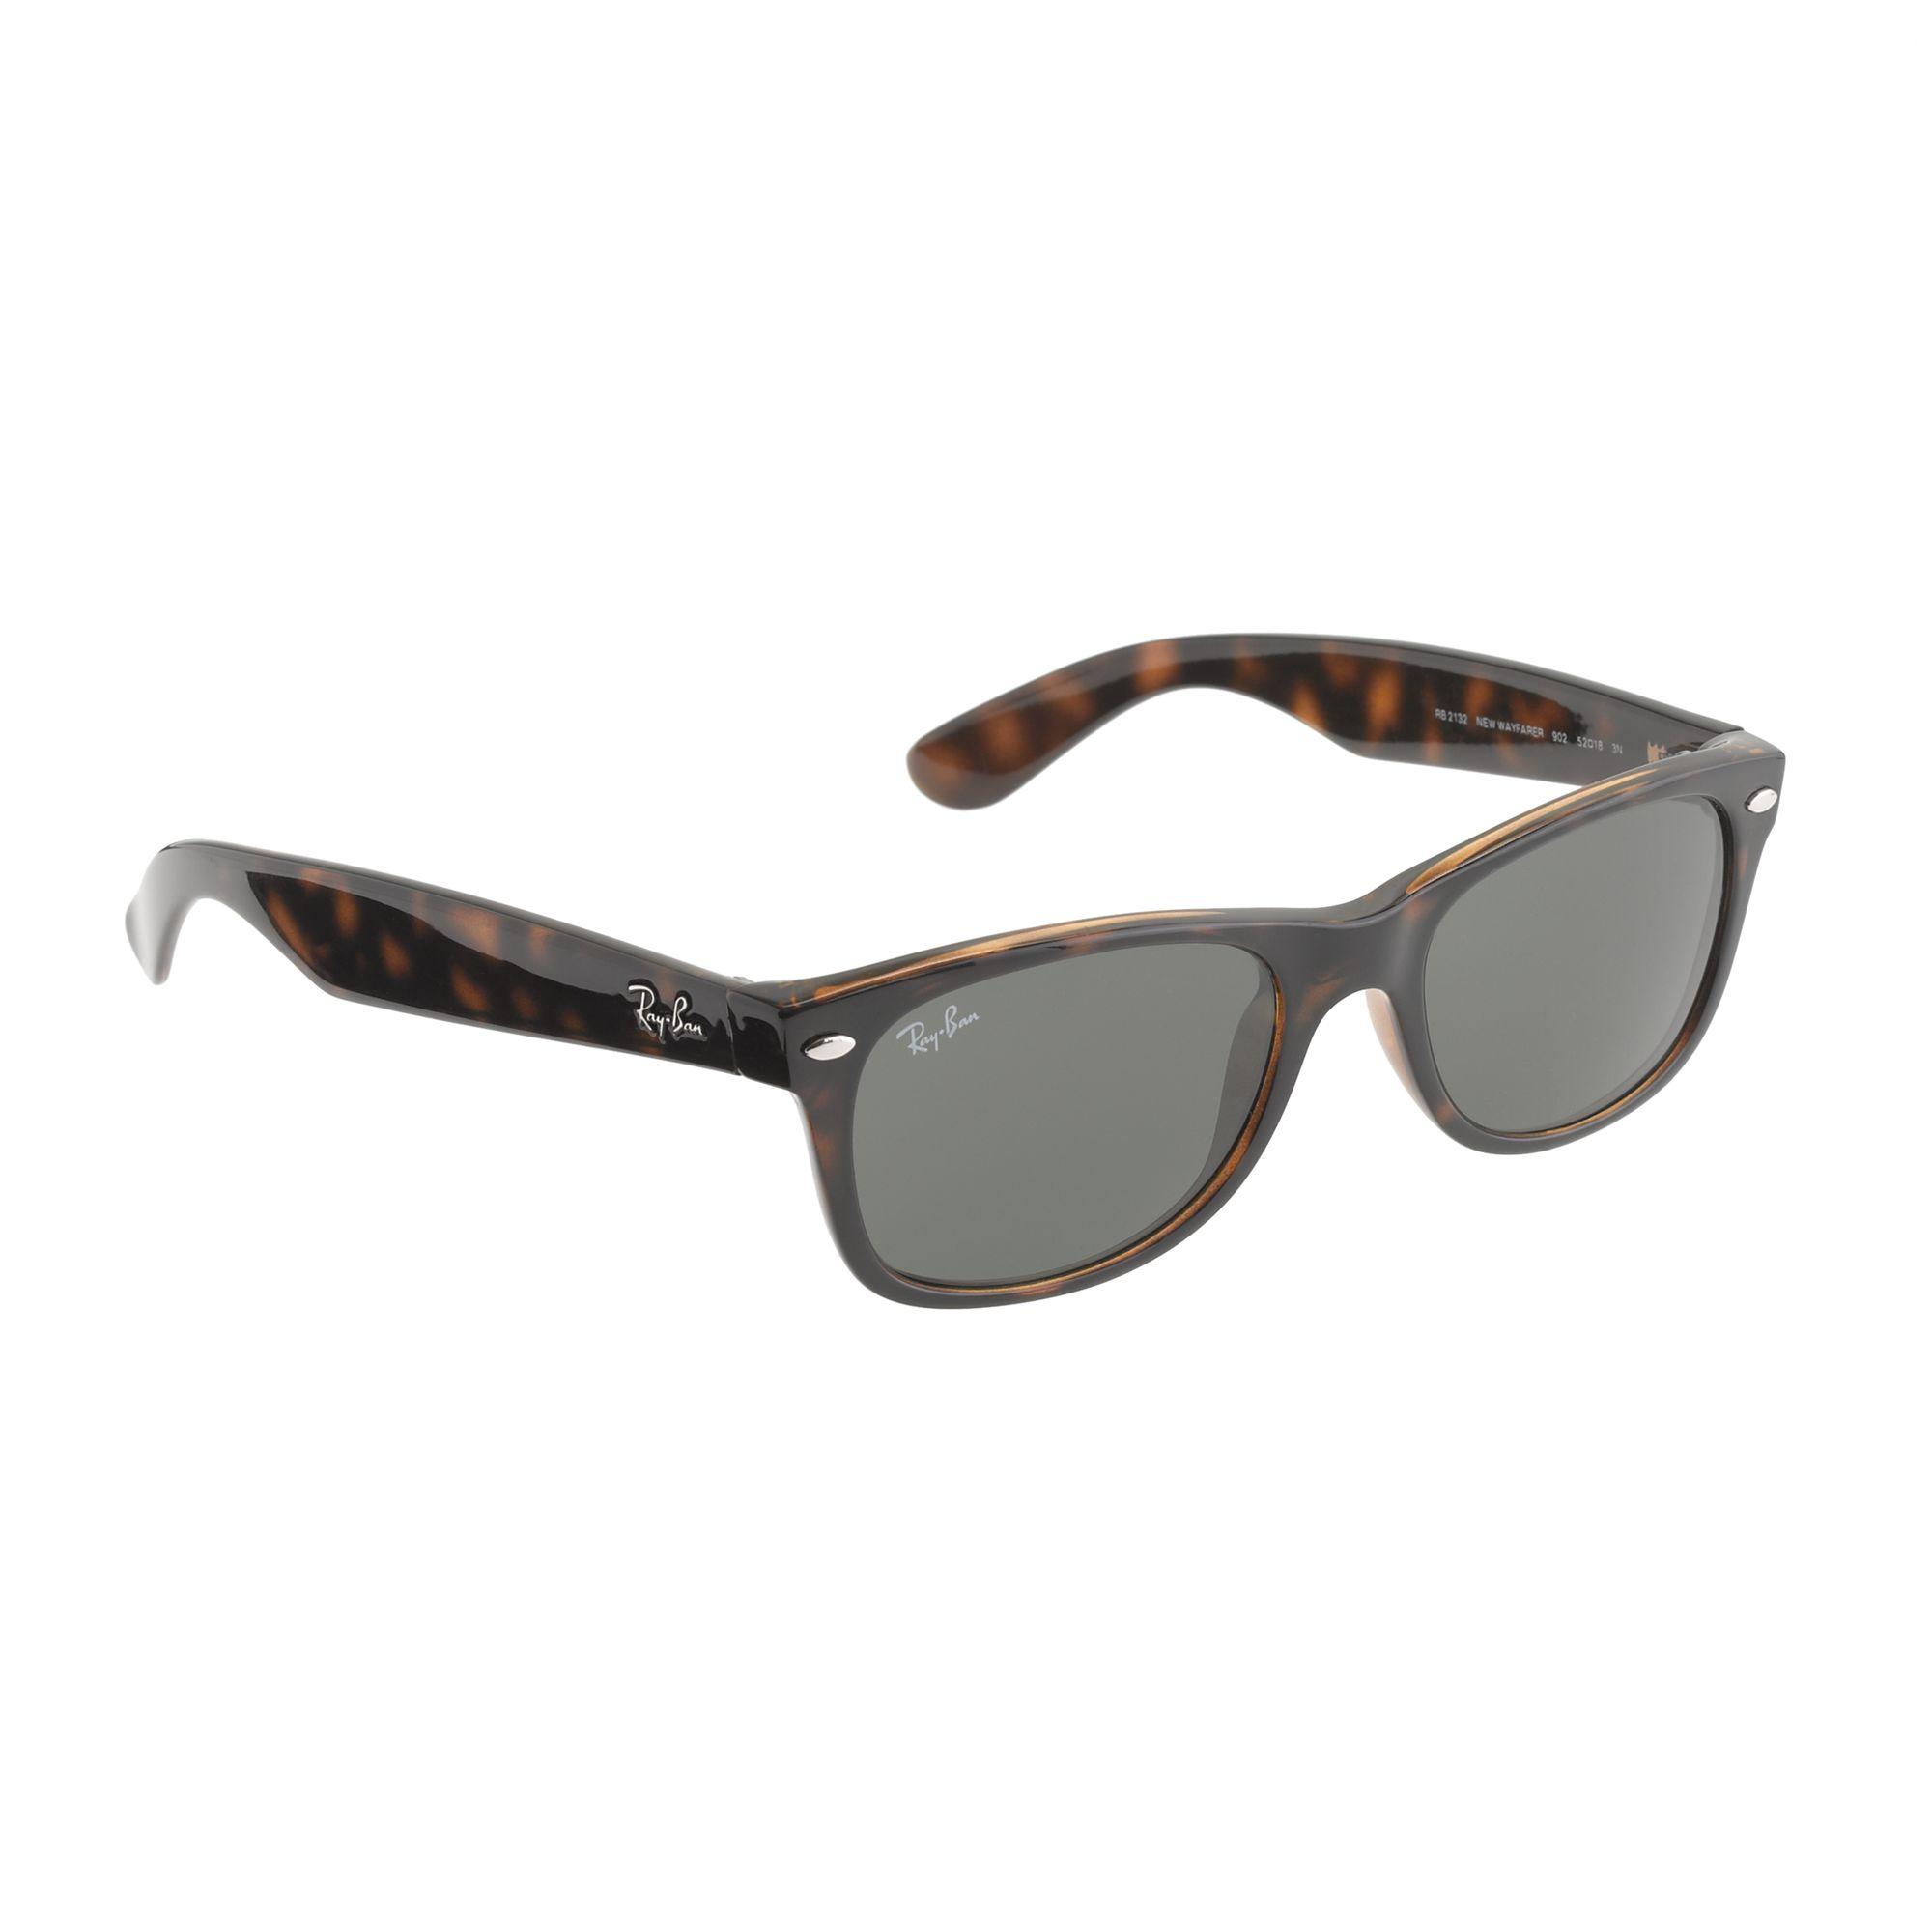 ray ban new wayfarer sunglasses in brown for men tortoise lyst. Black Bedroom Furniture Sets. Home Design Ideas